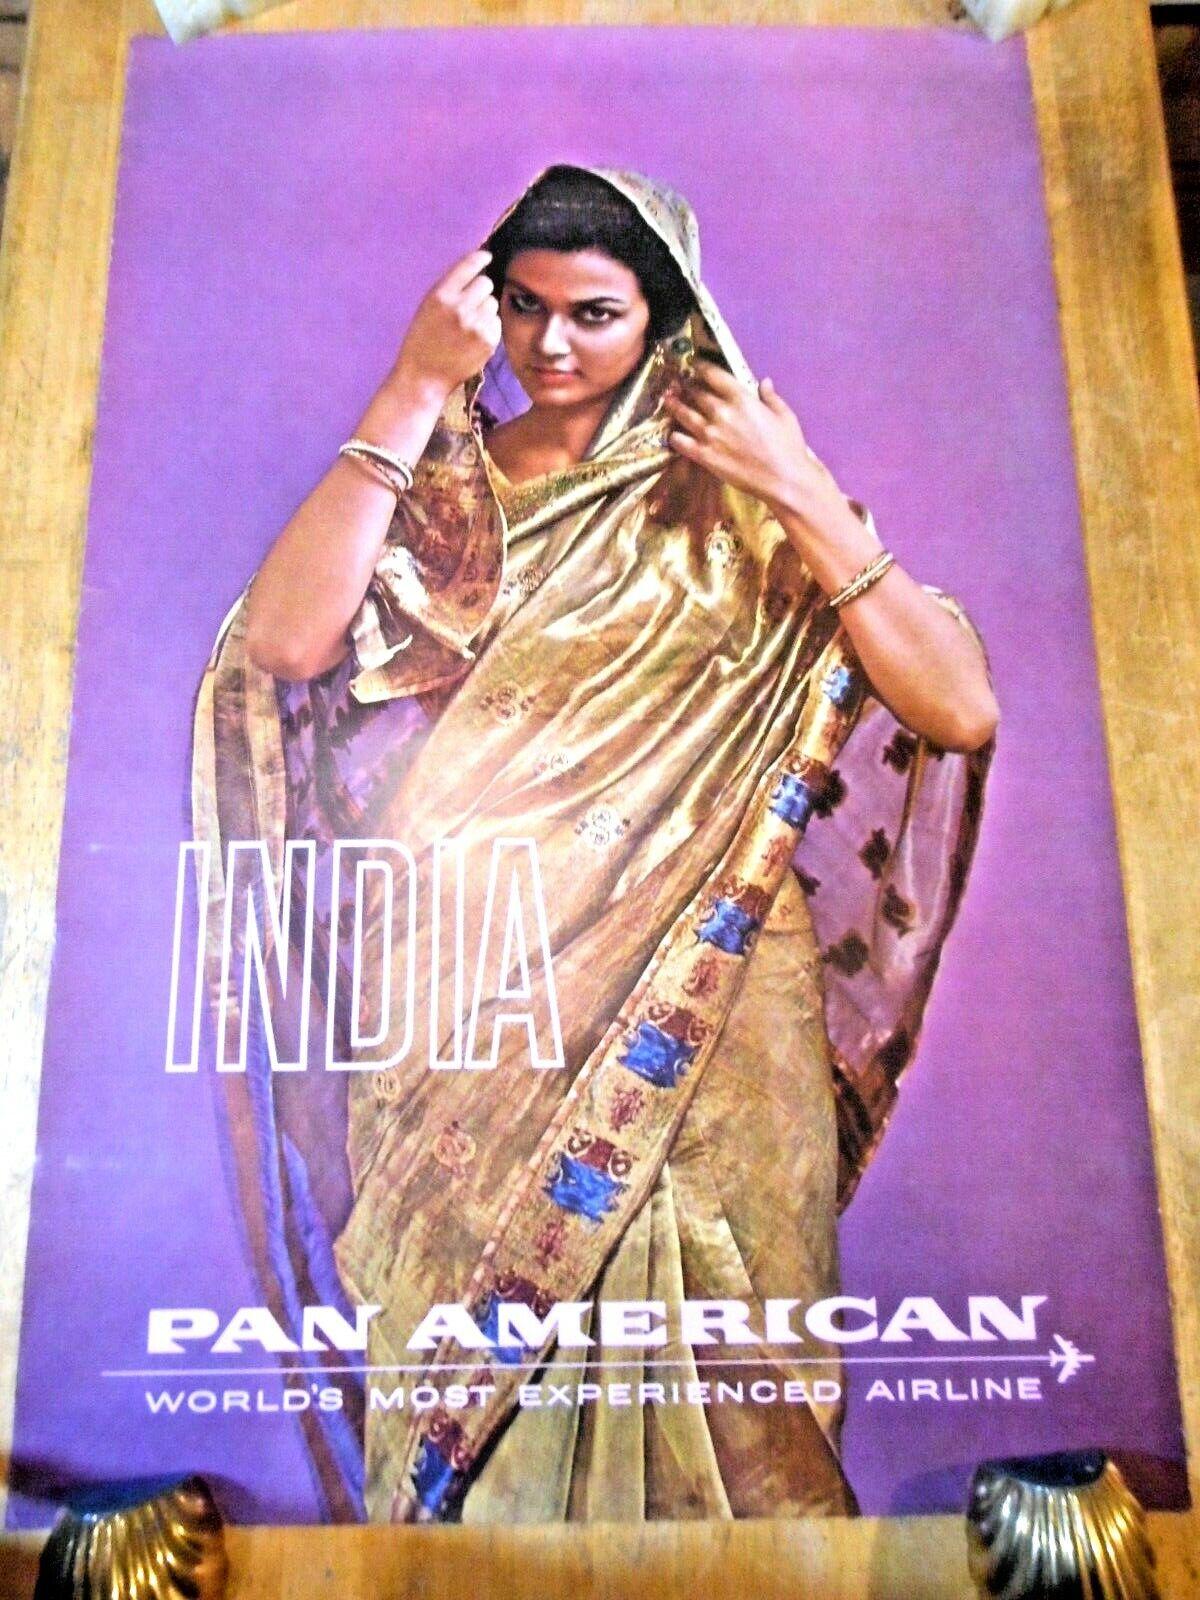 C 1960S INDIA PAN AM AIRLINES ORIGINAL TRAVEL POSTER PRETTY WOMAN IN GOLD SARI - $9.95